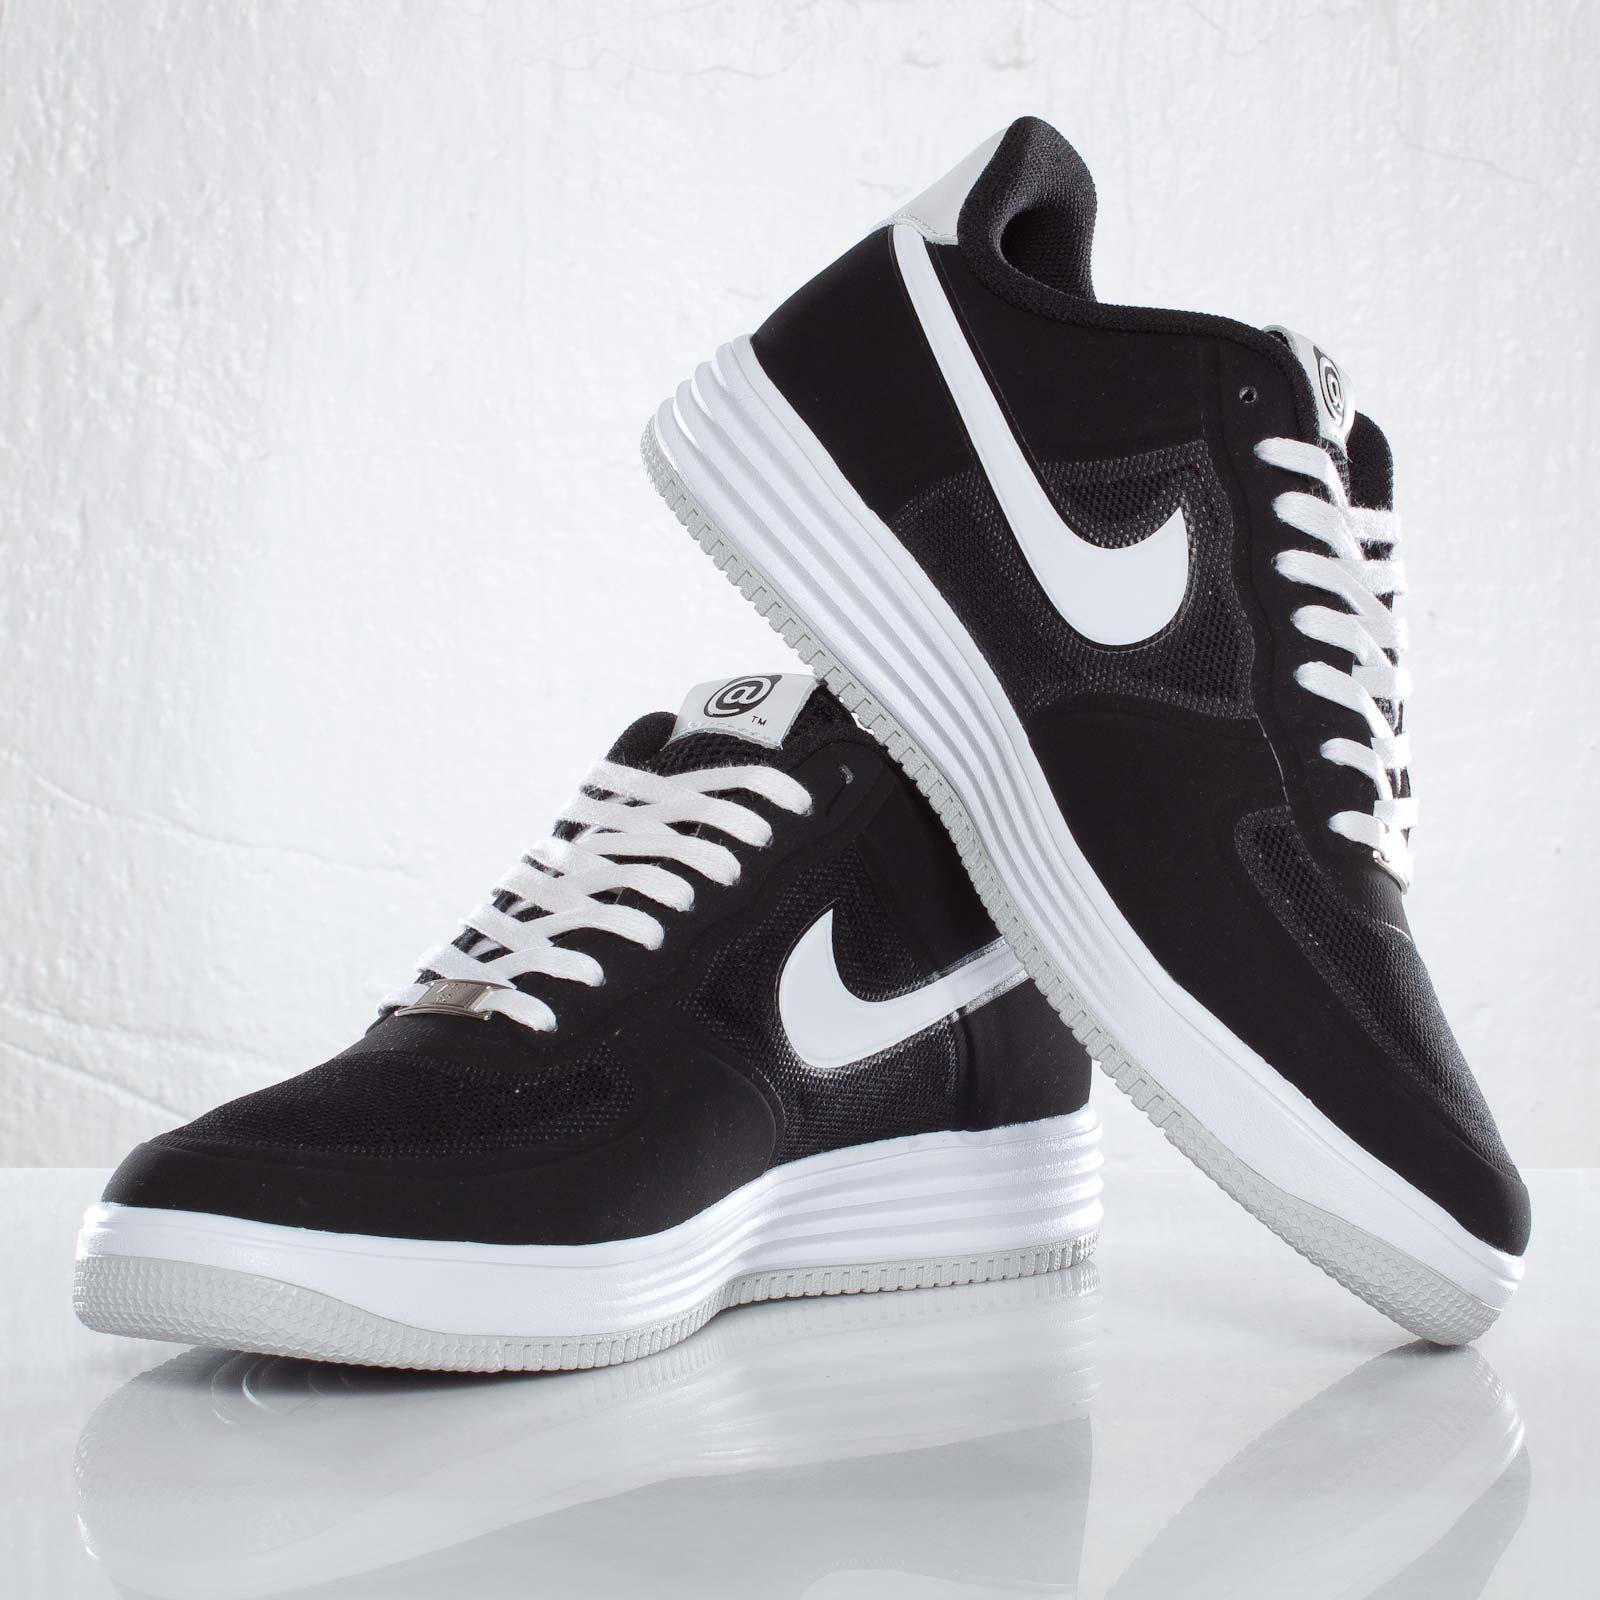 huge selection of 16099 a996b Nike Lunar Force 1 Fuse NRG - 573980-003 - Sneakersnstuff   sneakers    streetwear online since 1999